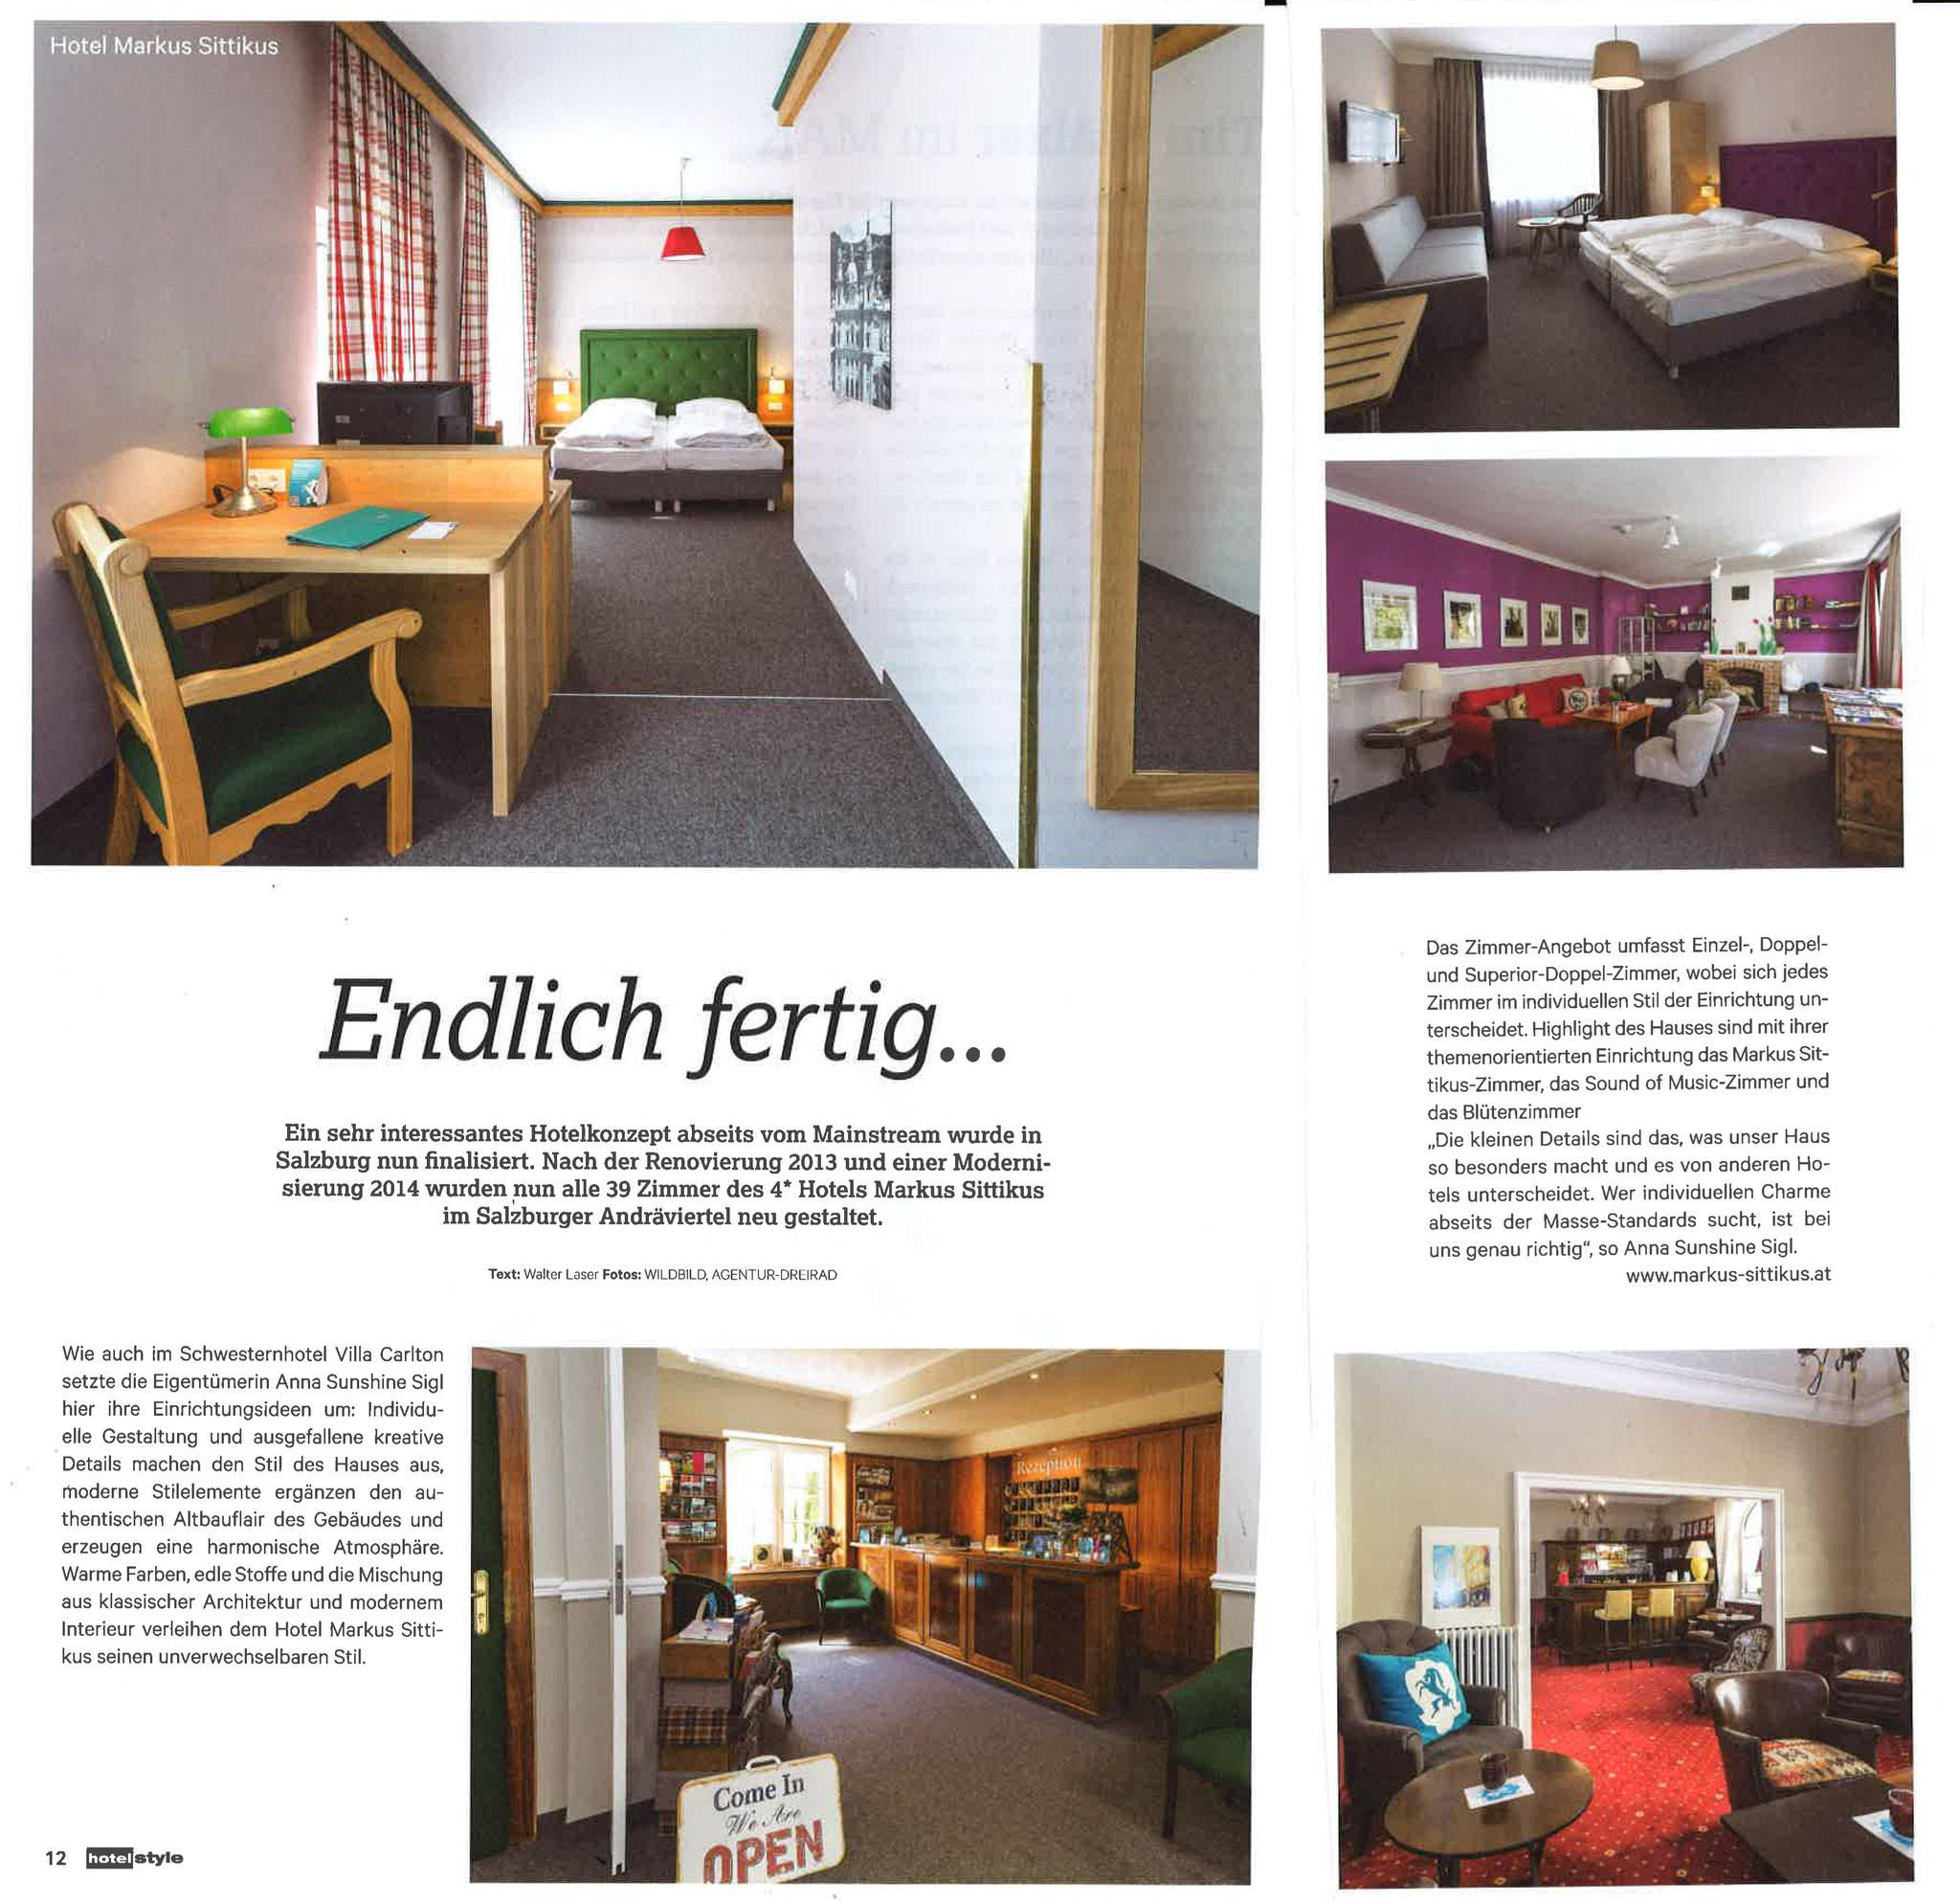 Hotel&Style, Oktober 2015